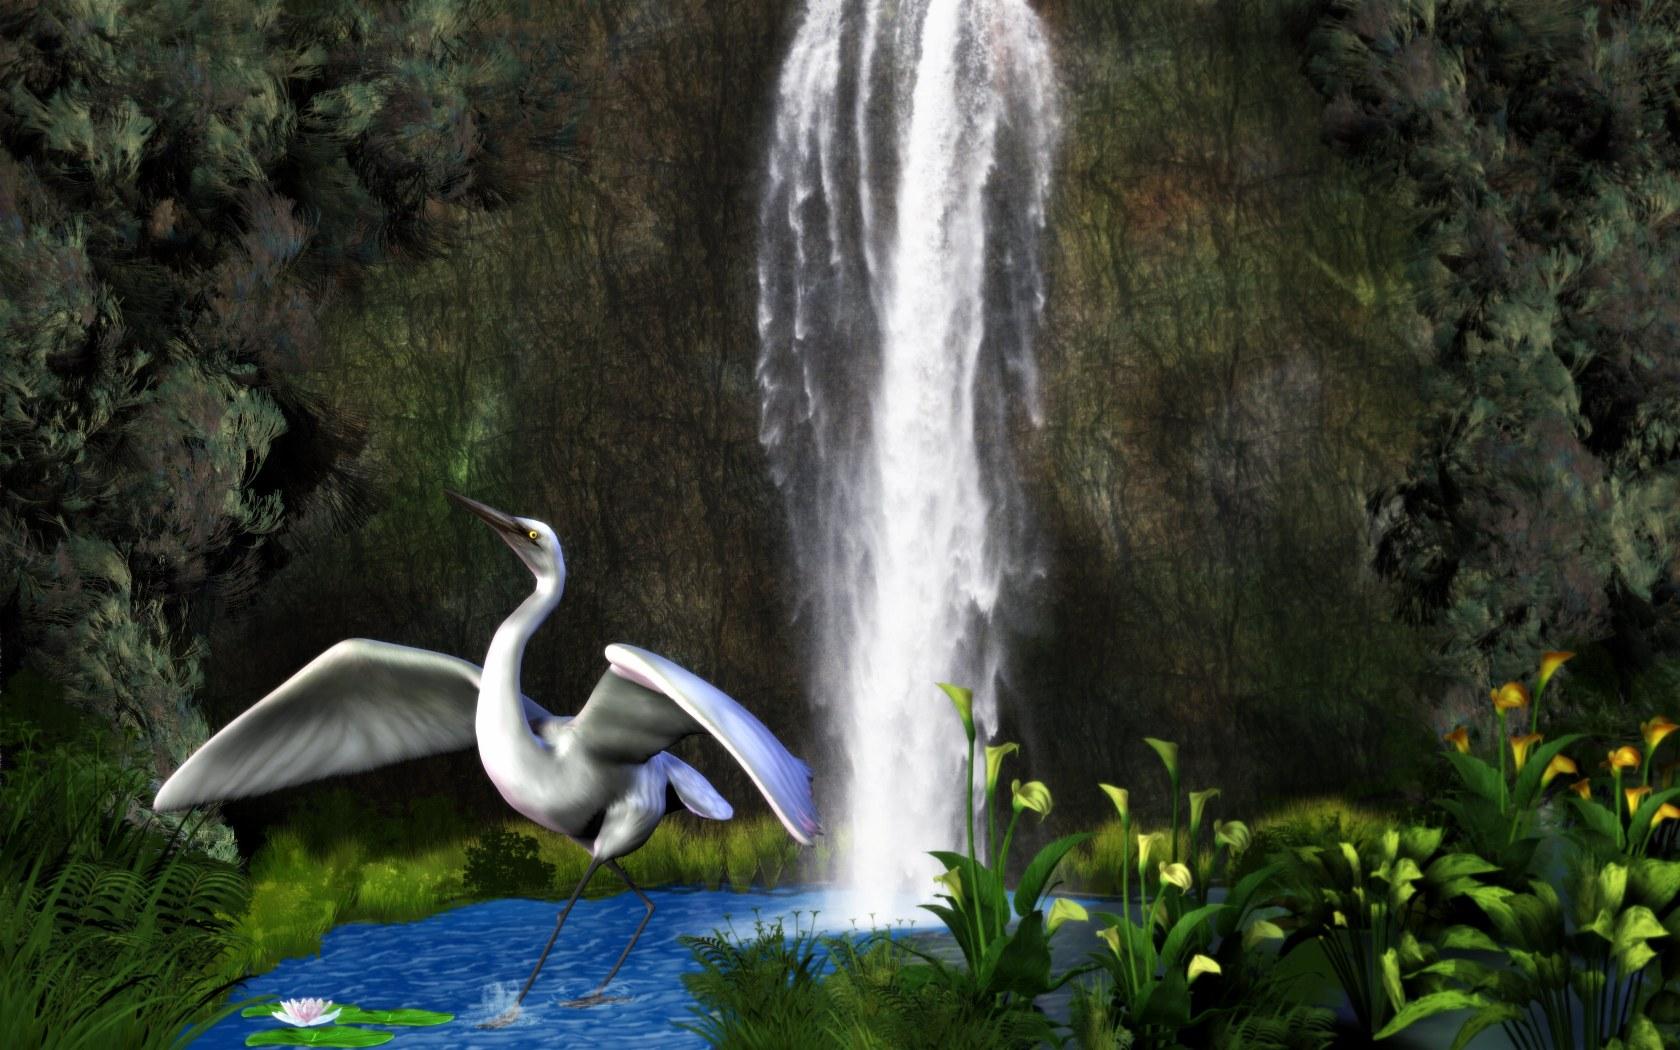 Egret by mainbearing